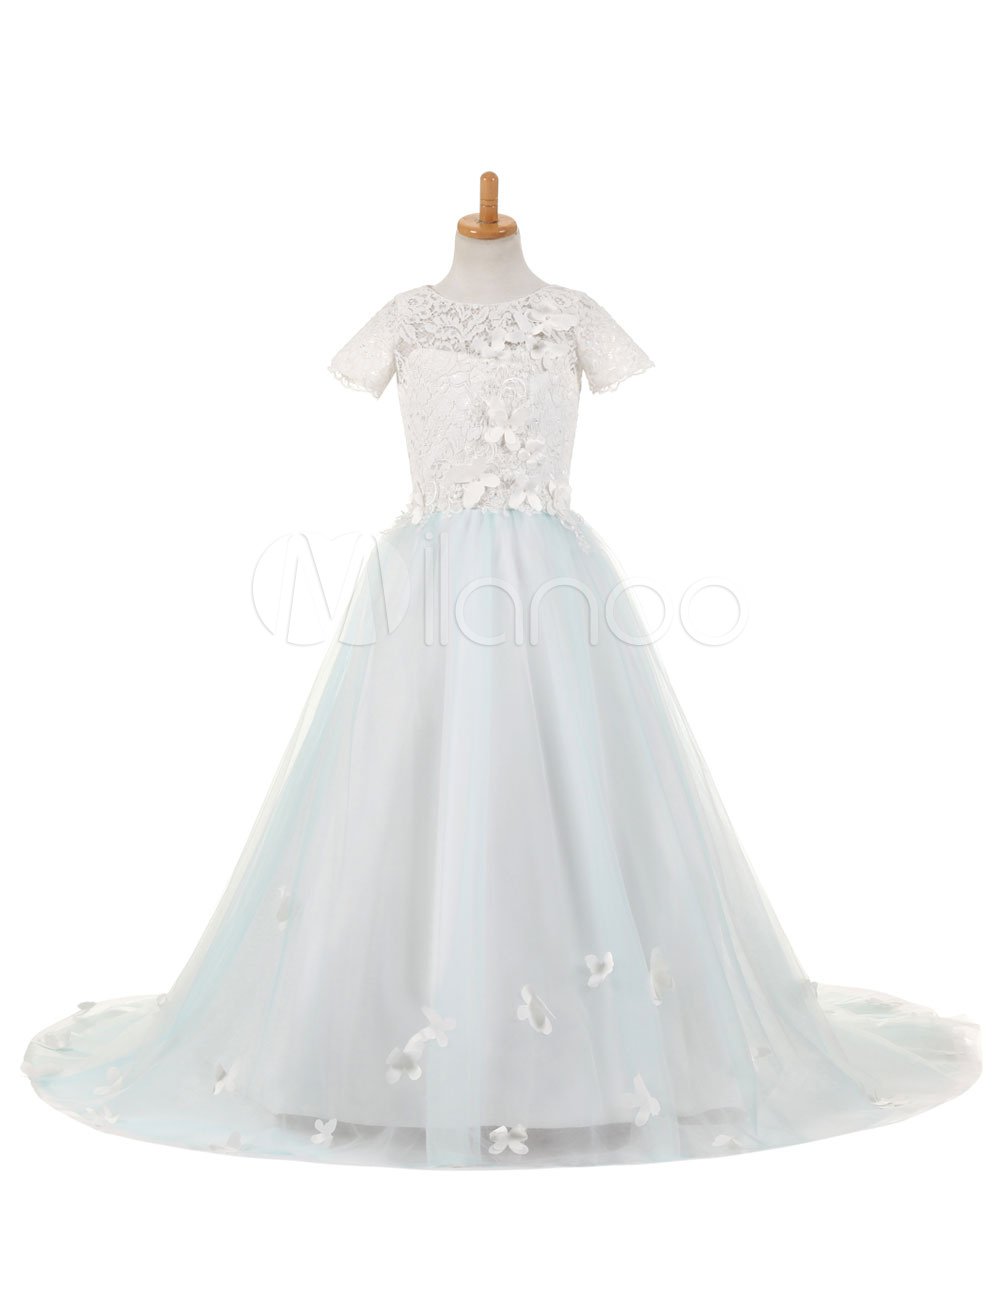 649d159e11470 ... Flower Girl Dresses Lace Tulle Satin Applique Kids' Pageant Dresses  Round Neck Short Sleeve Butterfly. 12. 45%OFF. Color:Pastel Blue